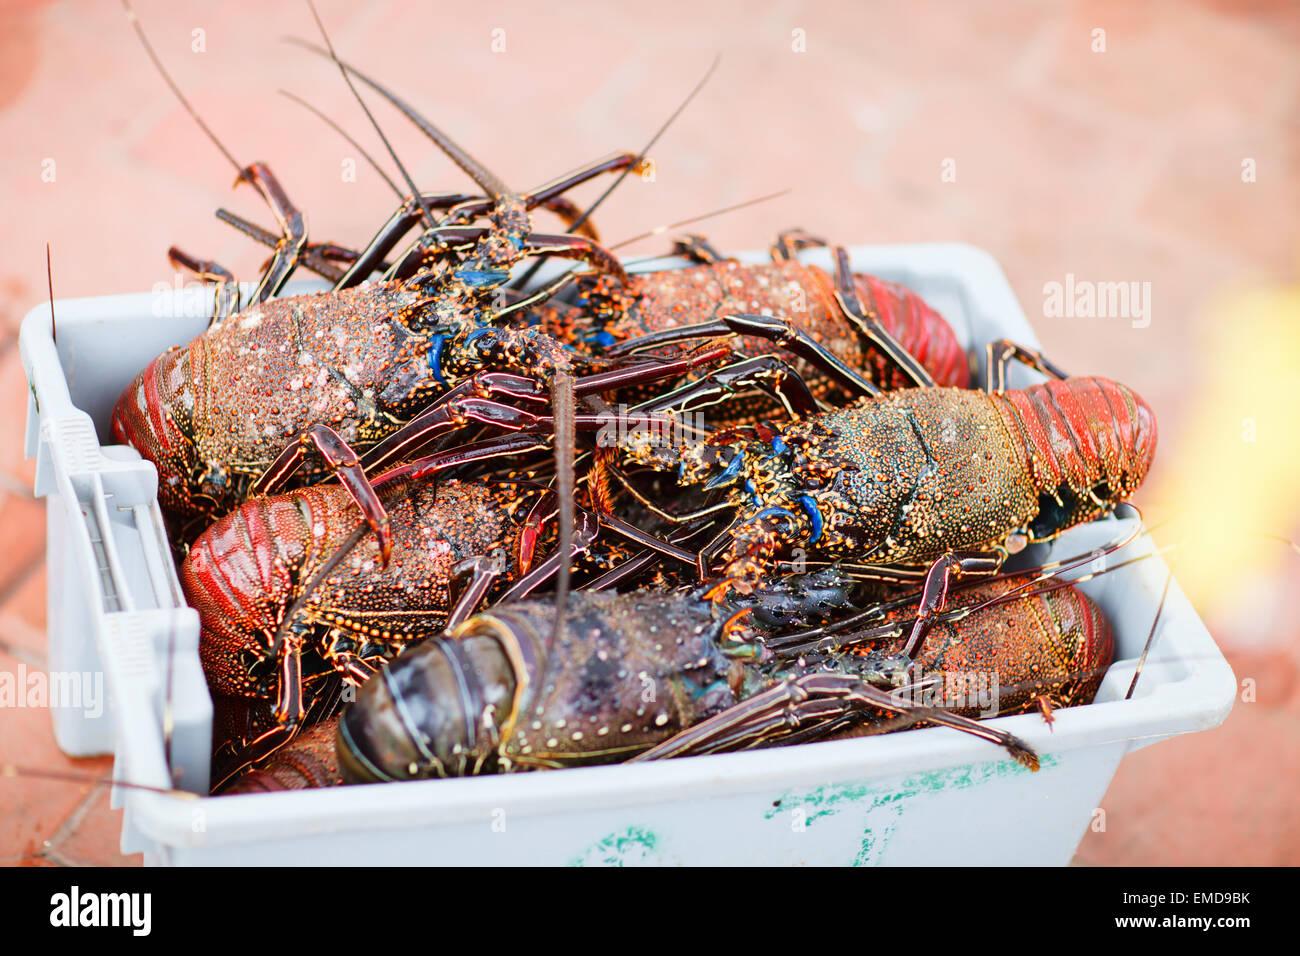 Lobster season - Stock Image